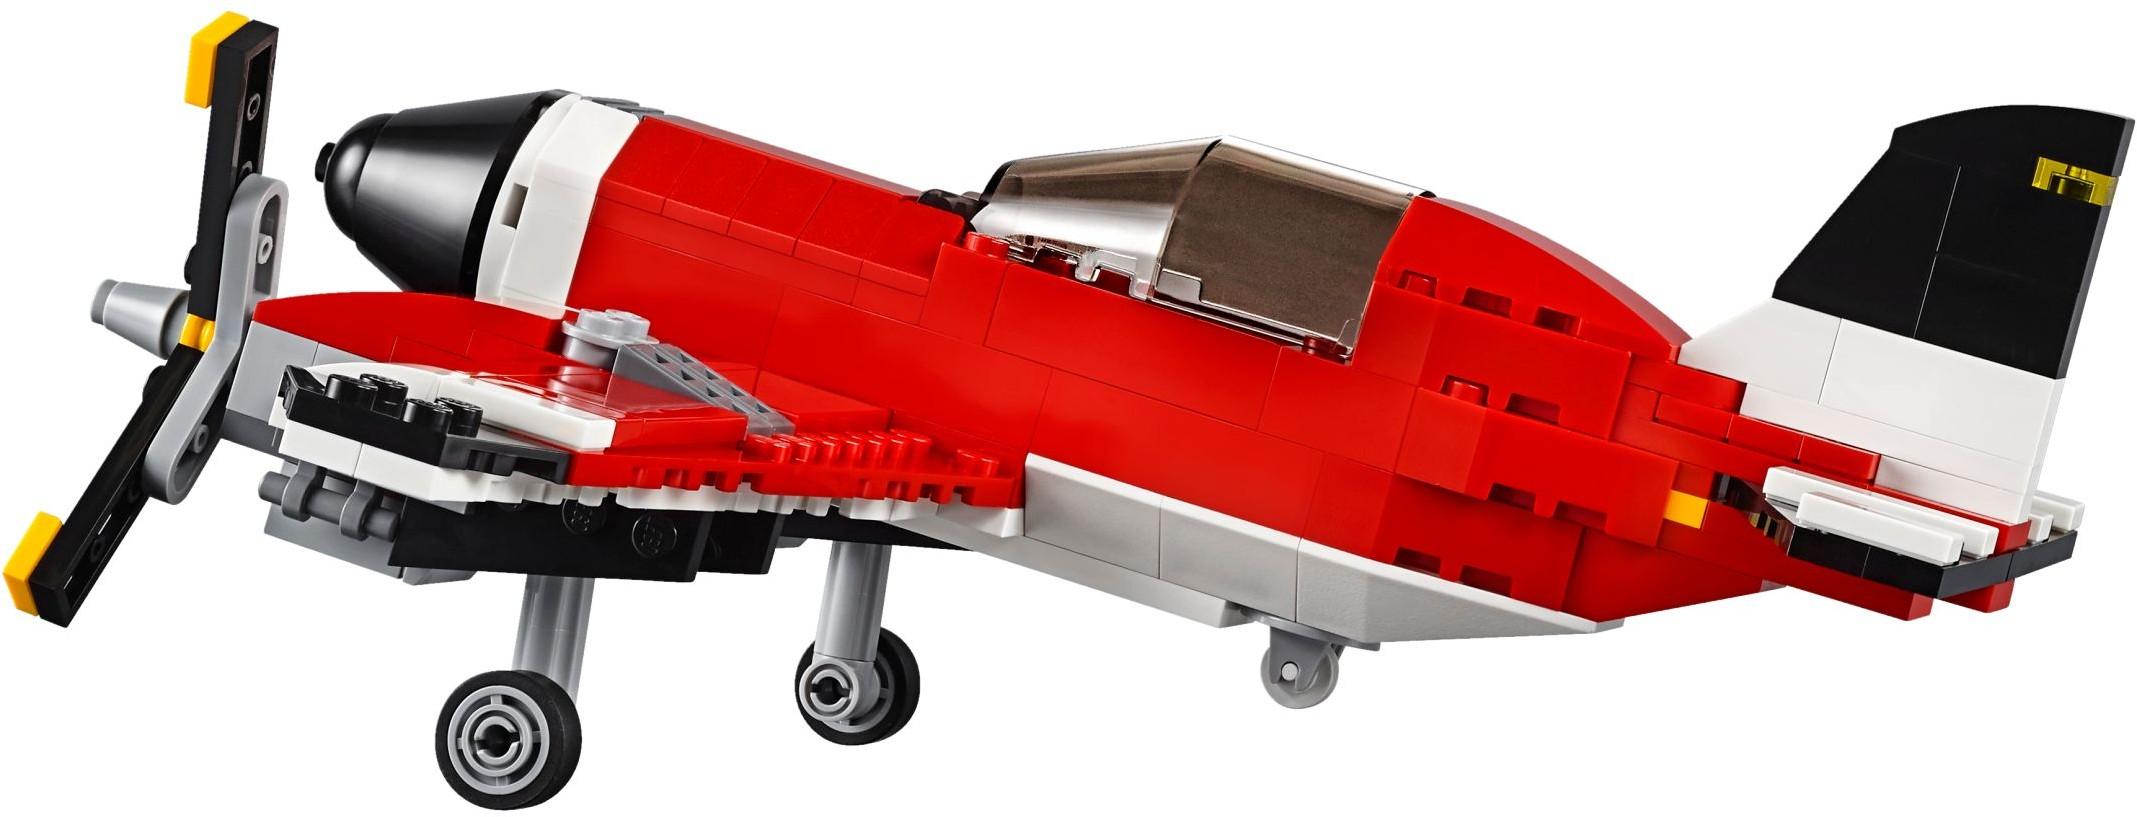 Cool Plane Propellers : Lego propeller plane